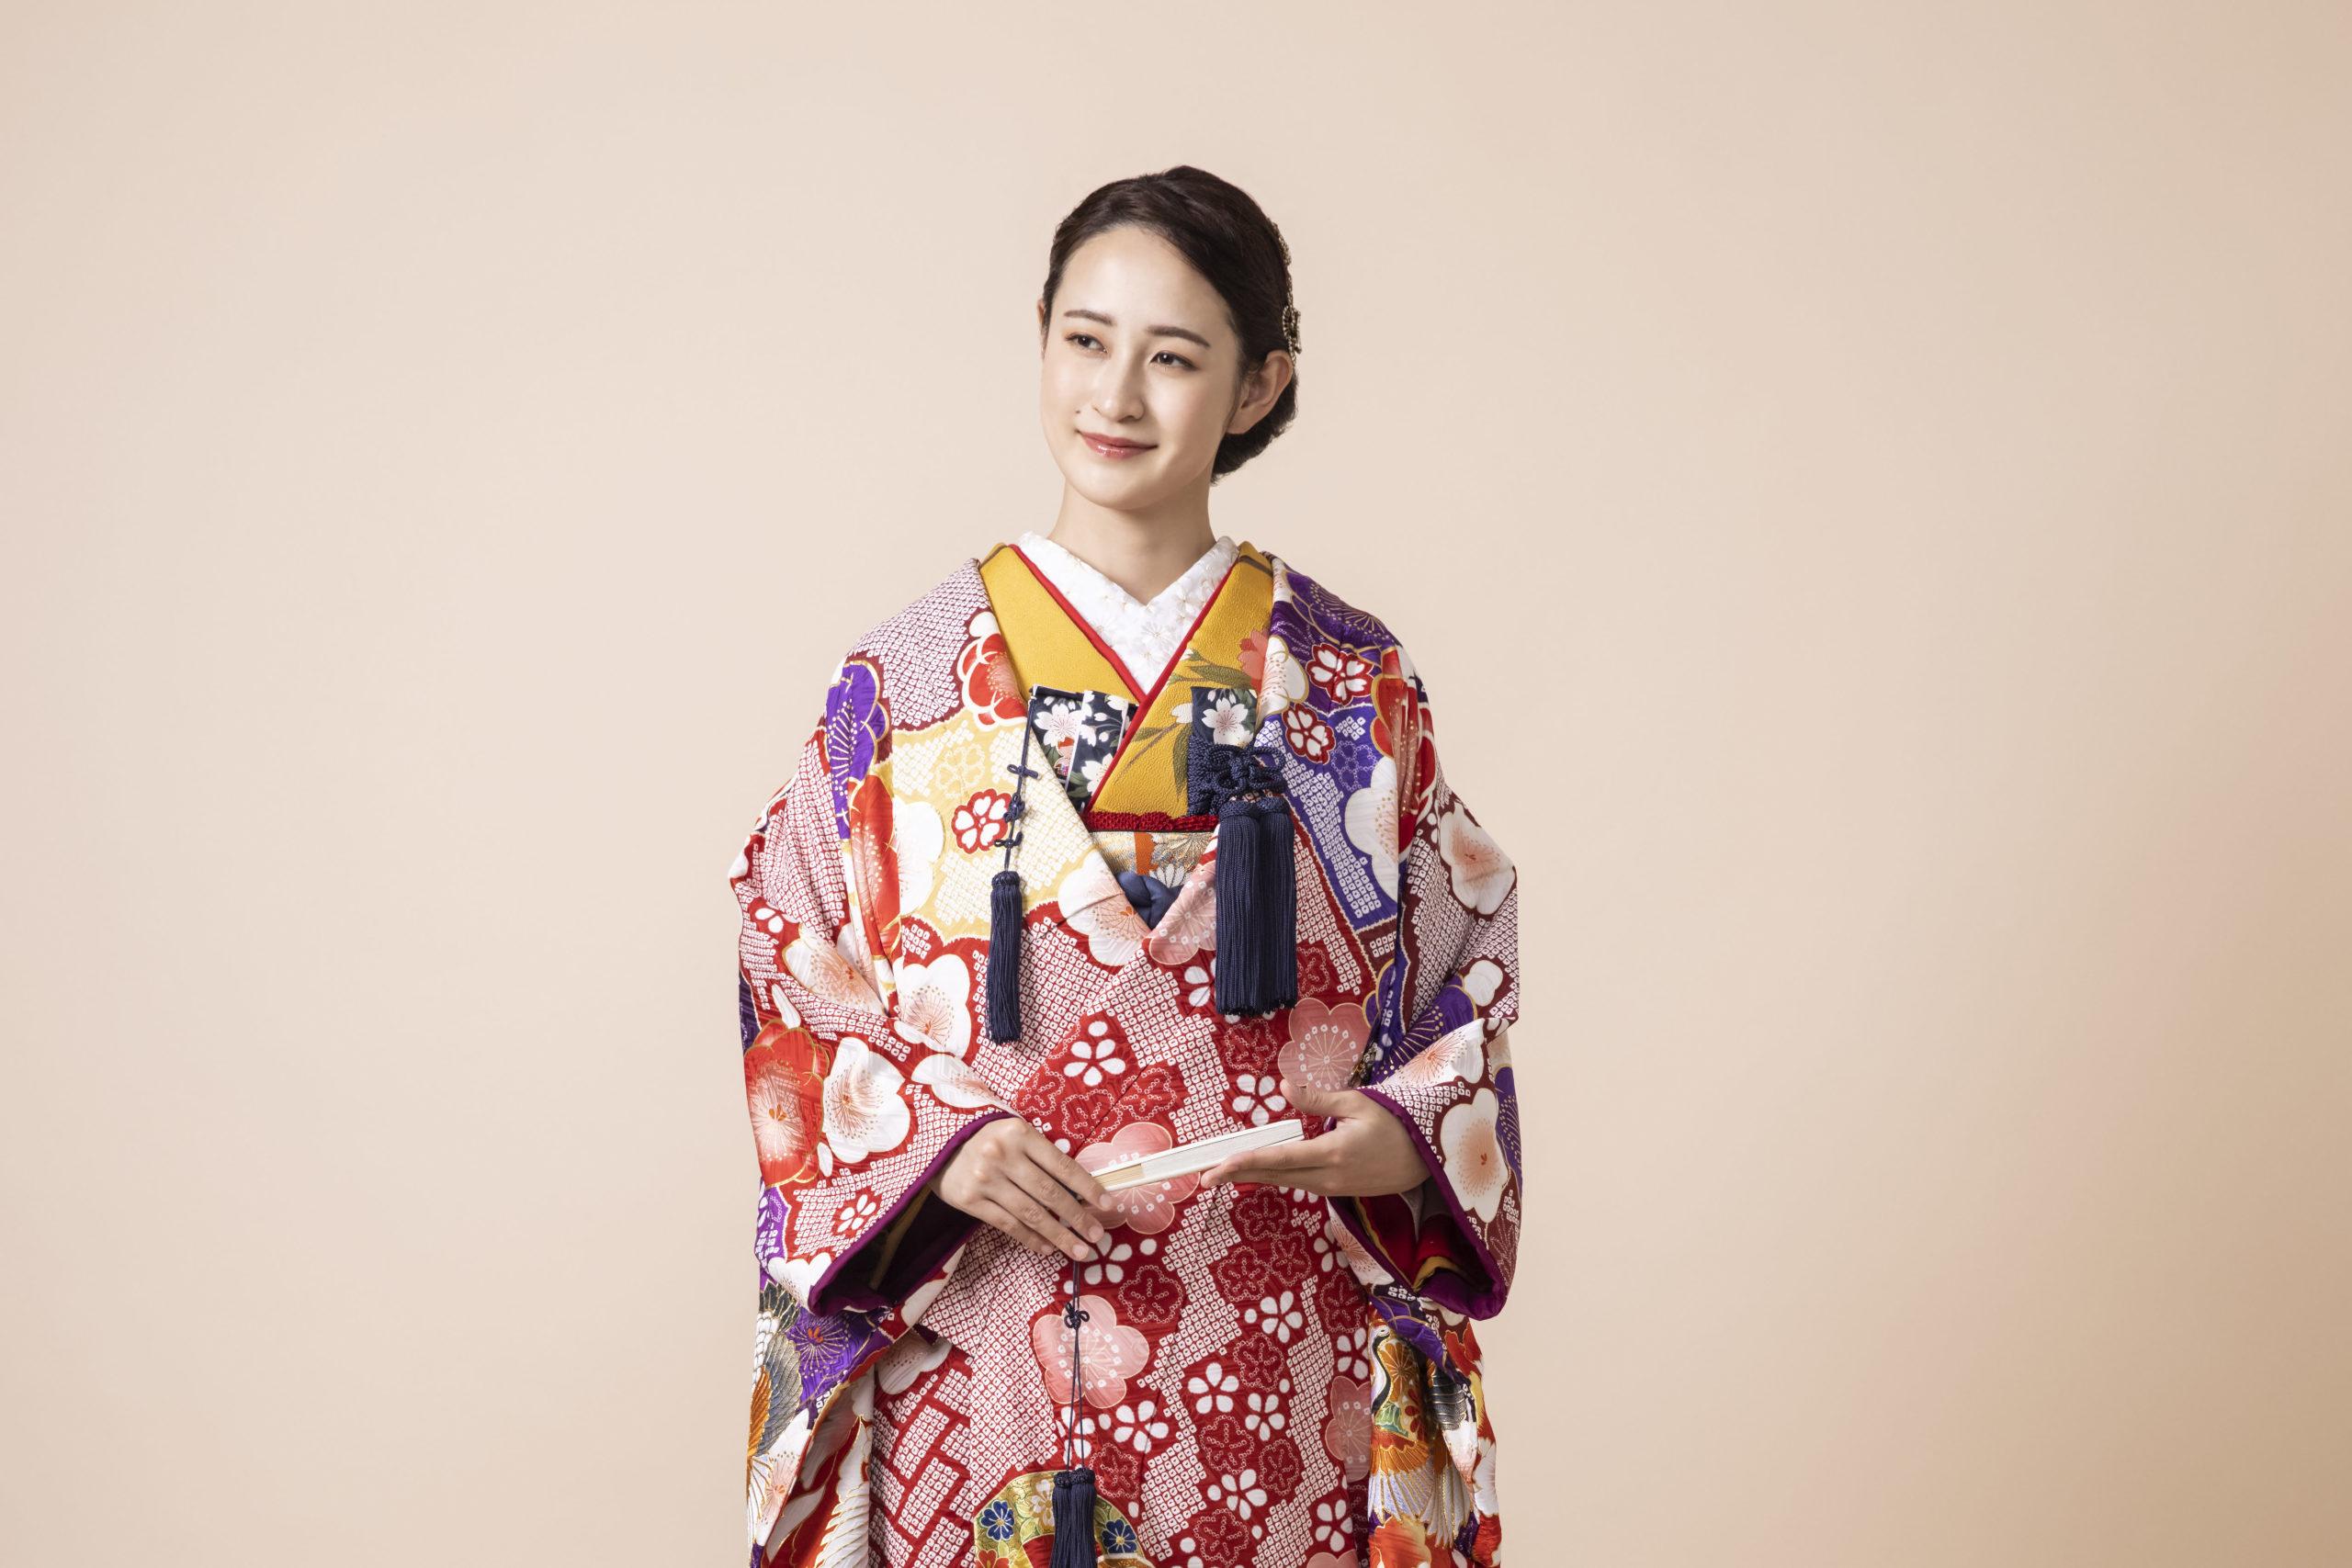 Authentique KIMONO JINJYA オーセンティック 神社 神社挙式 着物 白無垢 色打掛 神社婚 神前式